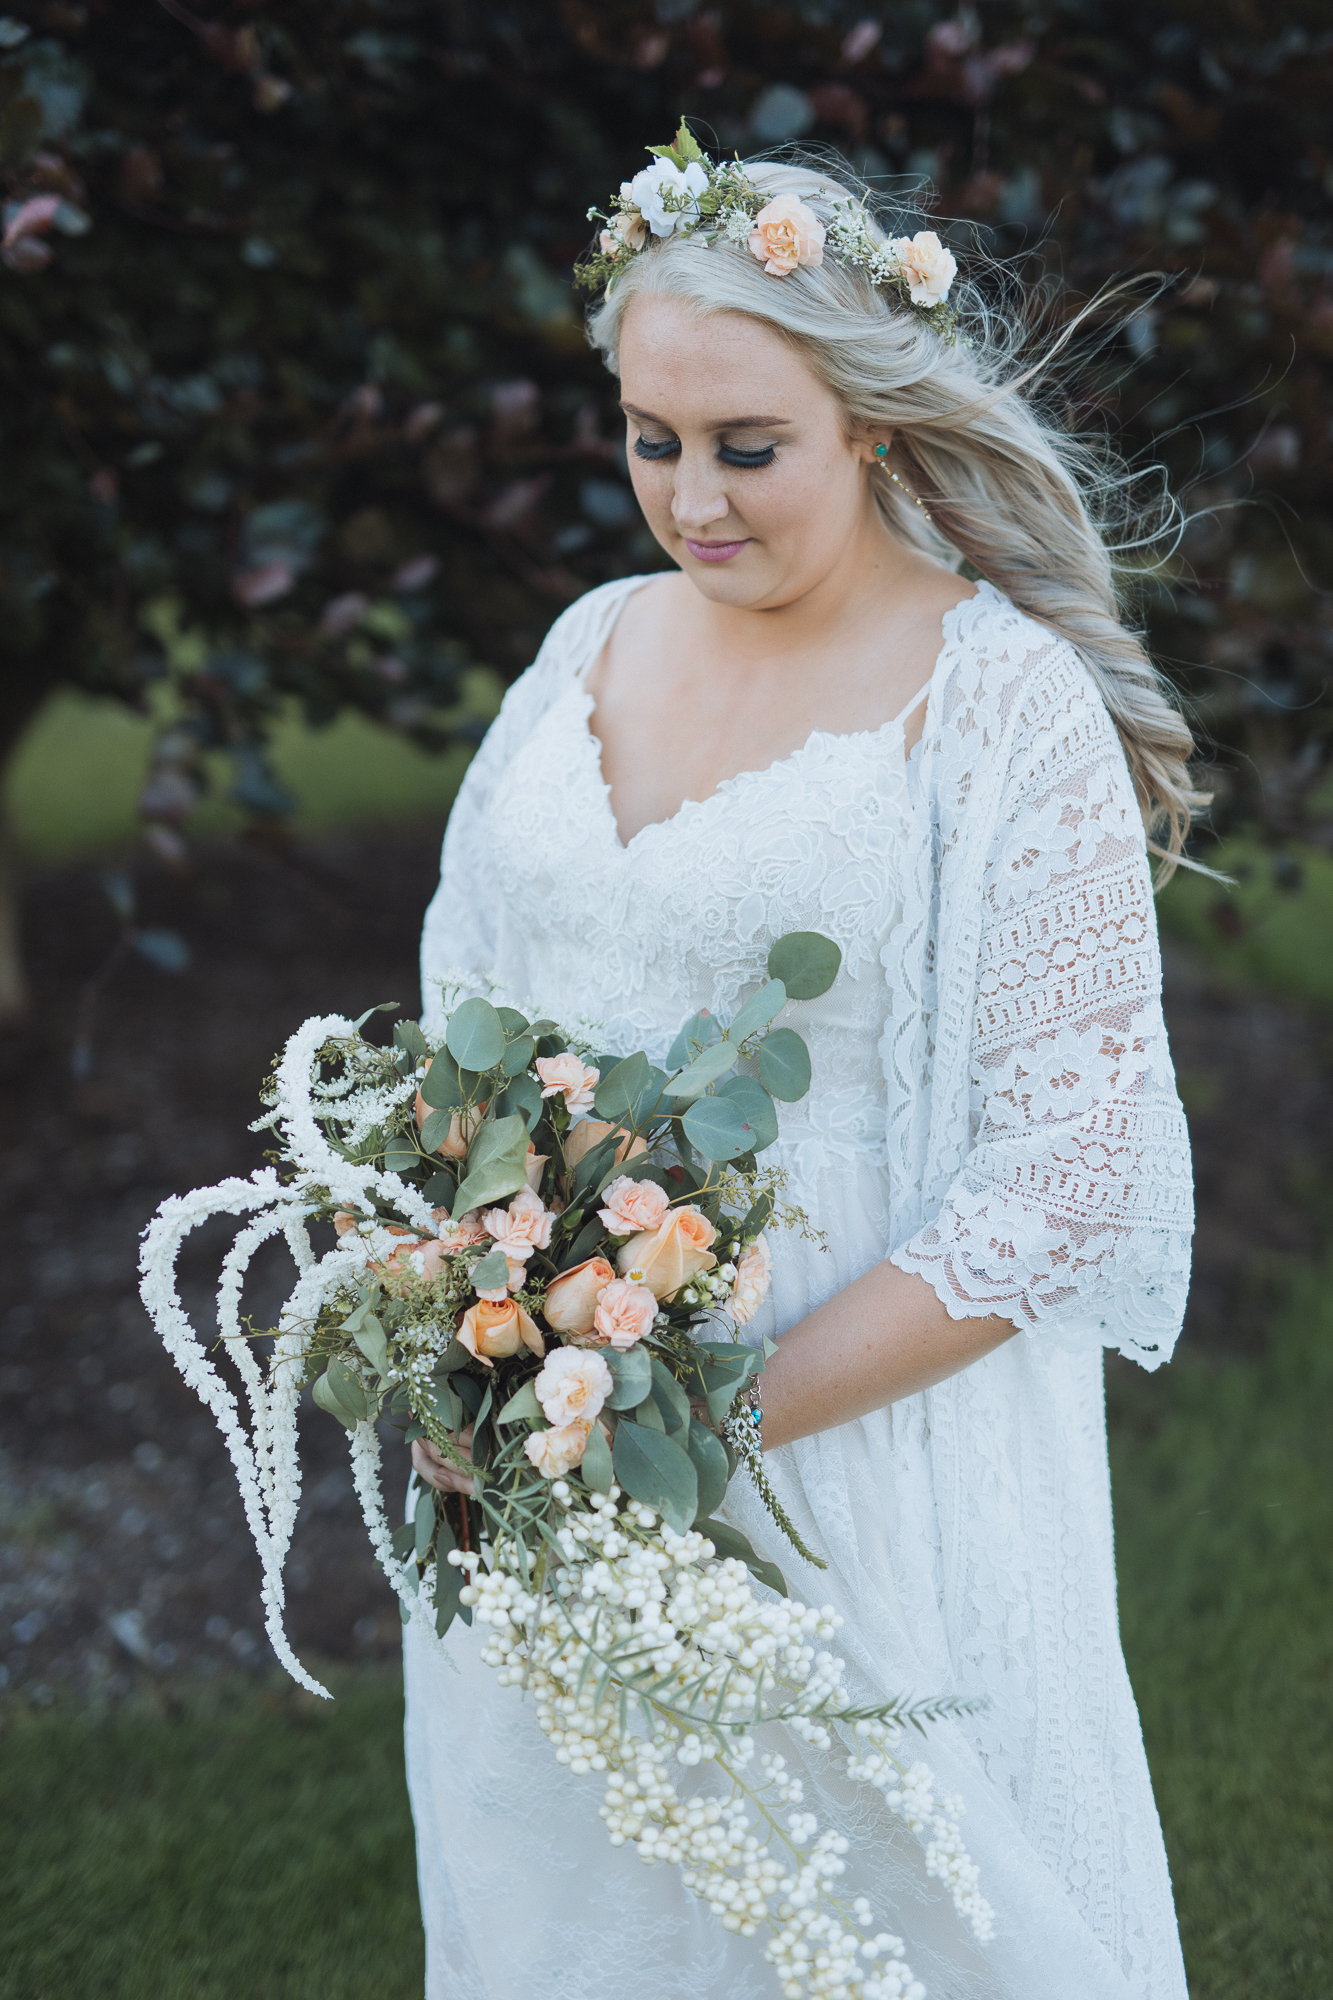 Kelsey - bride portrait